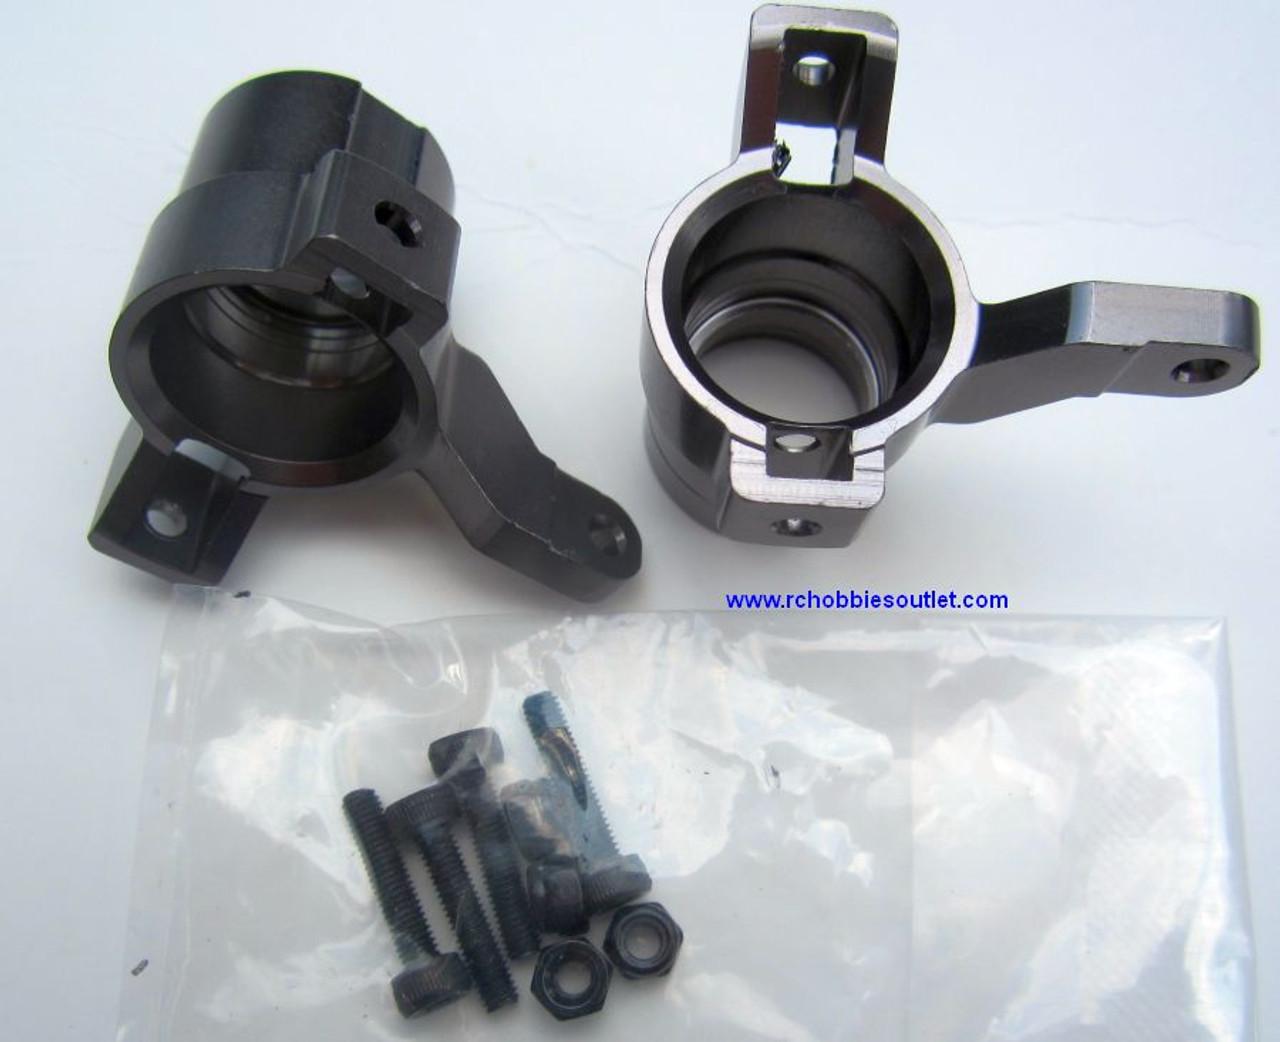 81705 Alloy Steering Arm/Hubs  1/8 Scale HSP BAZOOKA TORNADO, Redcat